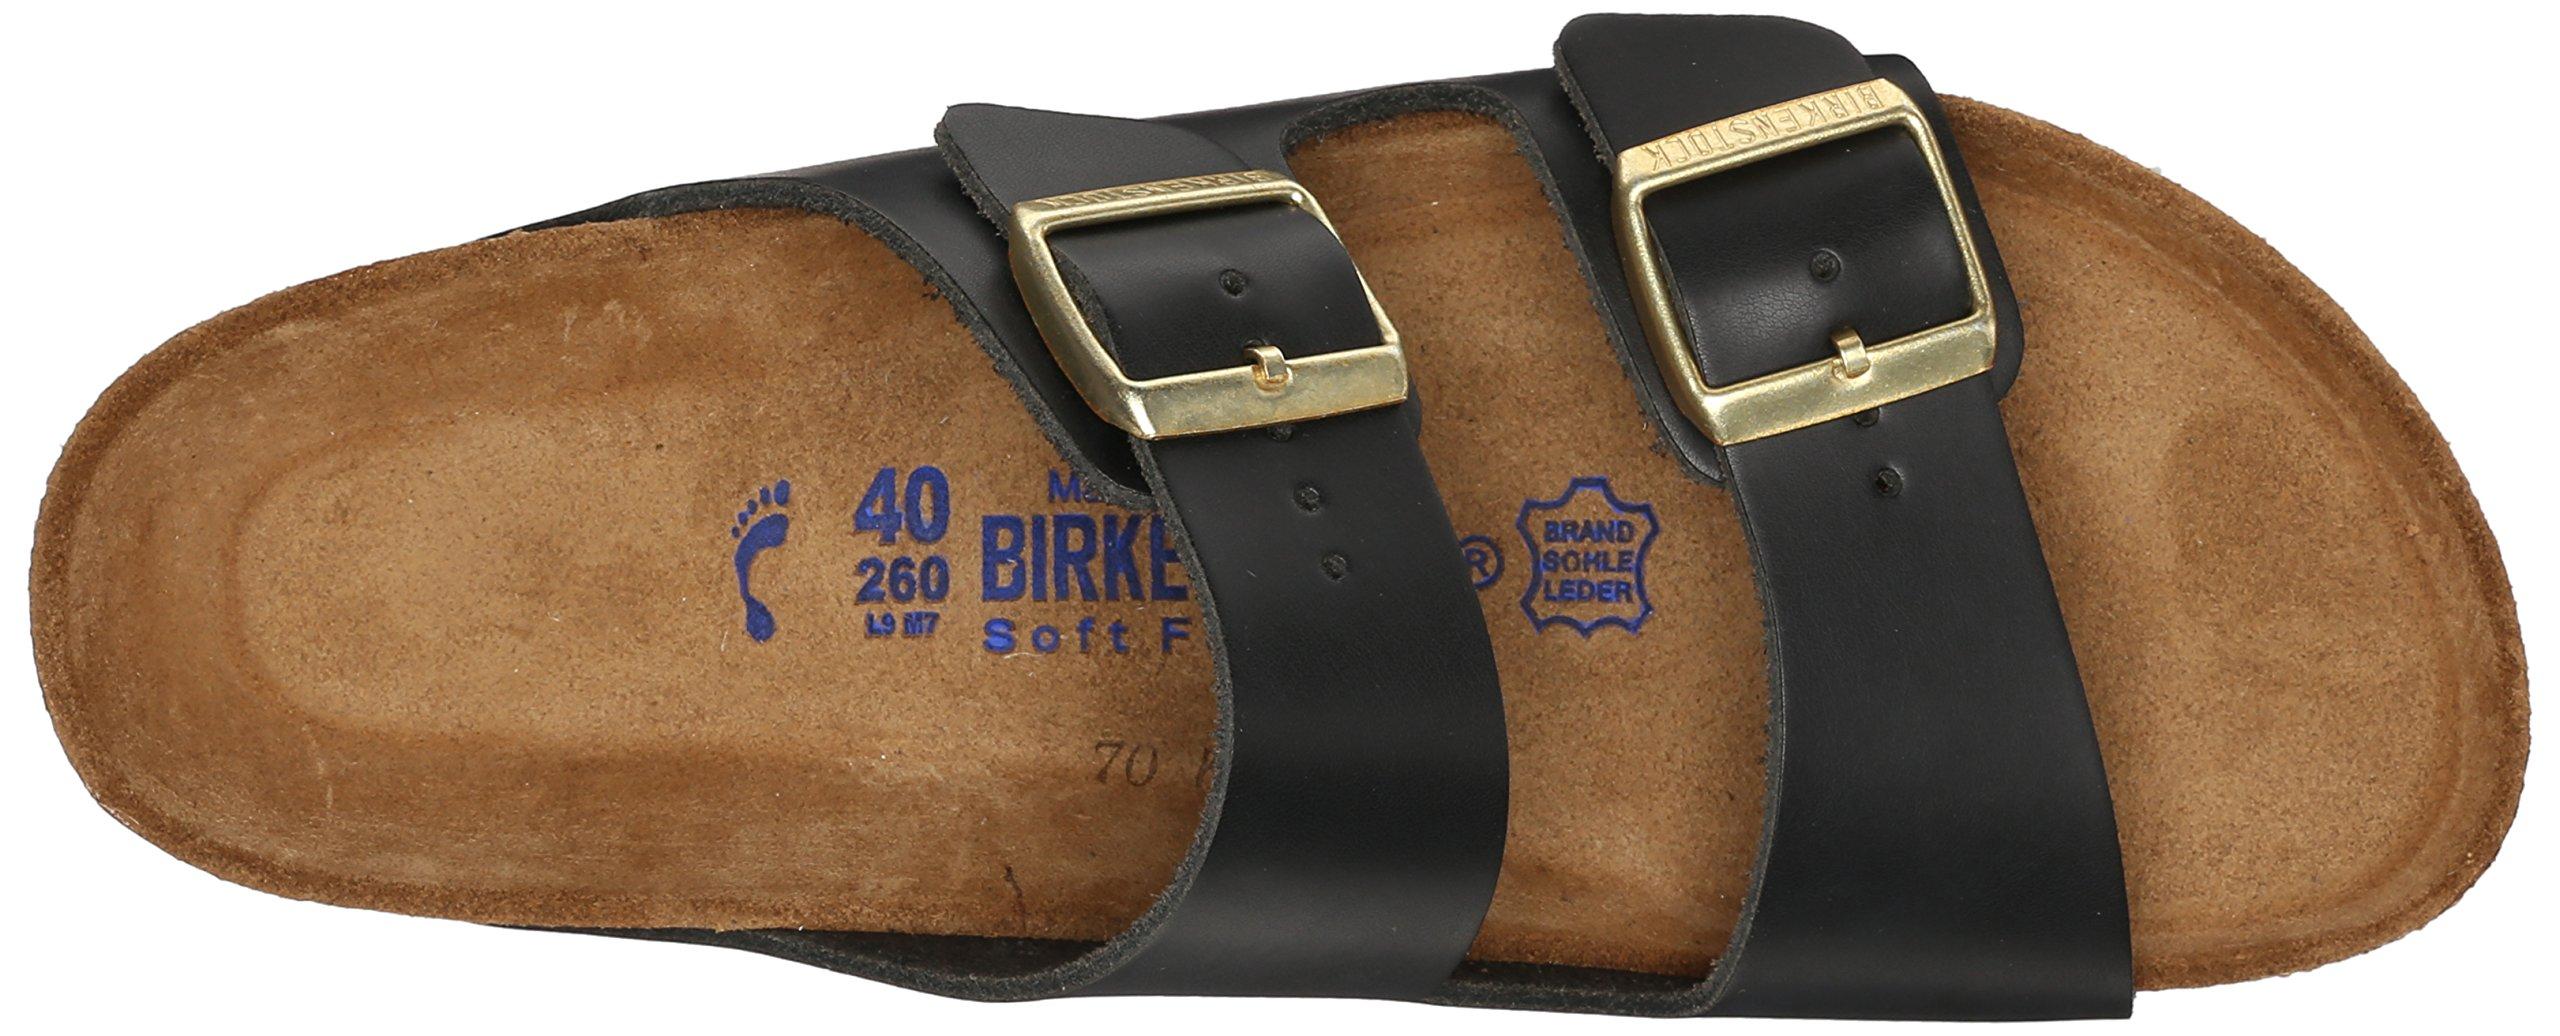 Birkenstock Unisex Arizona Hunter Black Leather Sandals - 9-9.5 2A(N) US Women/7-7.5 2A(N) US Men by Birkenstock (Image #8)